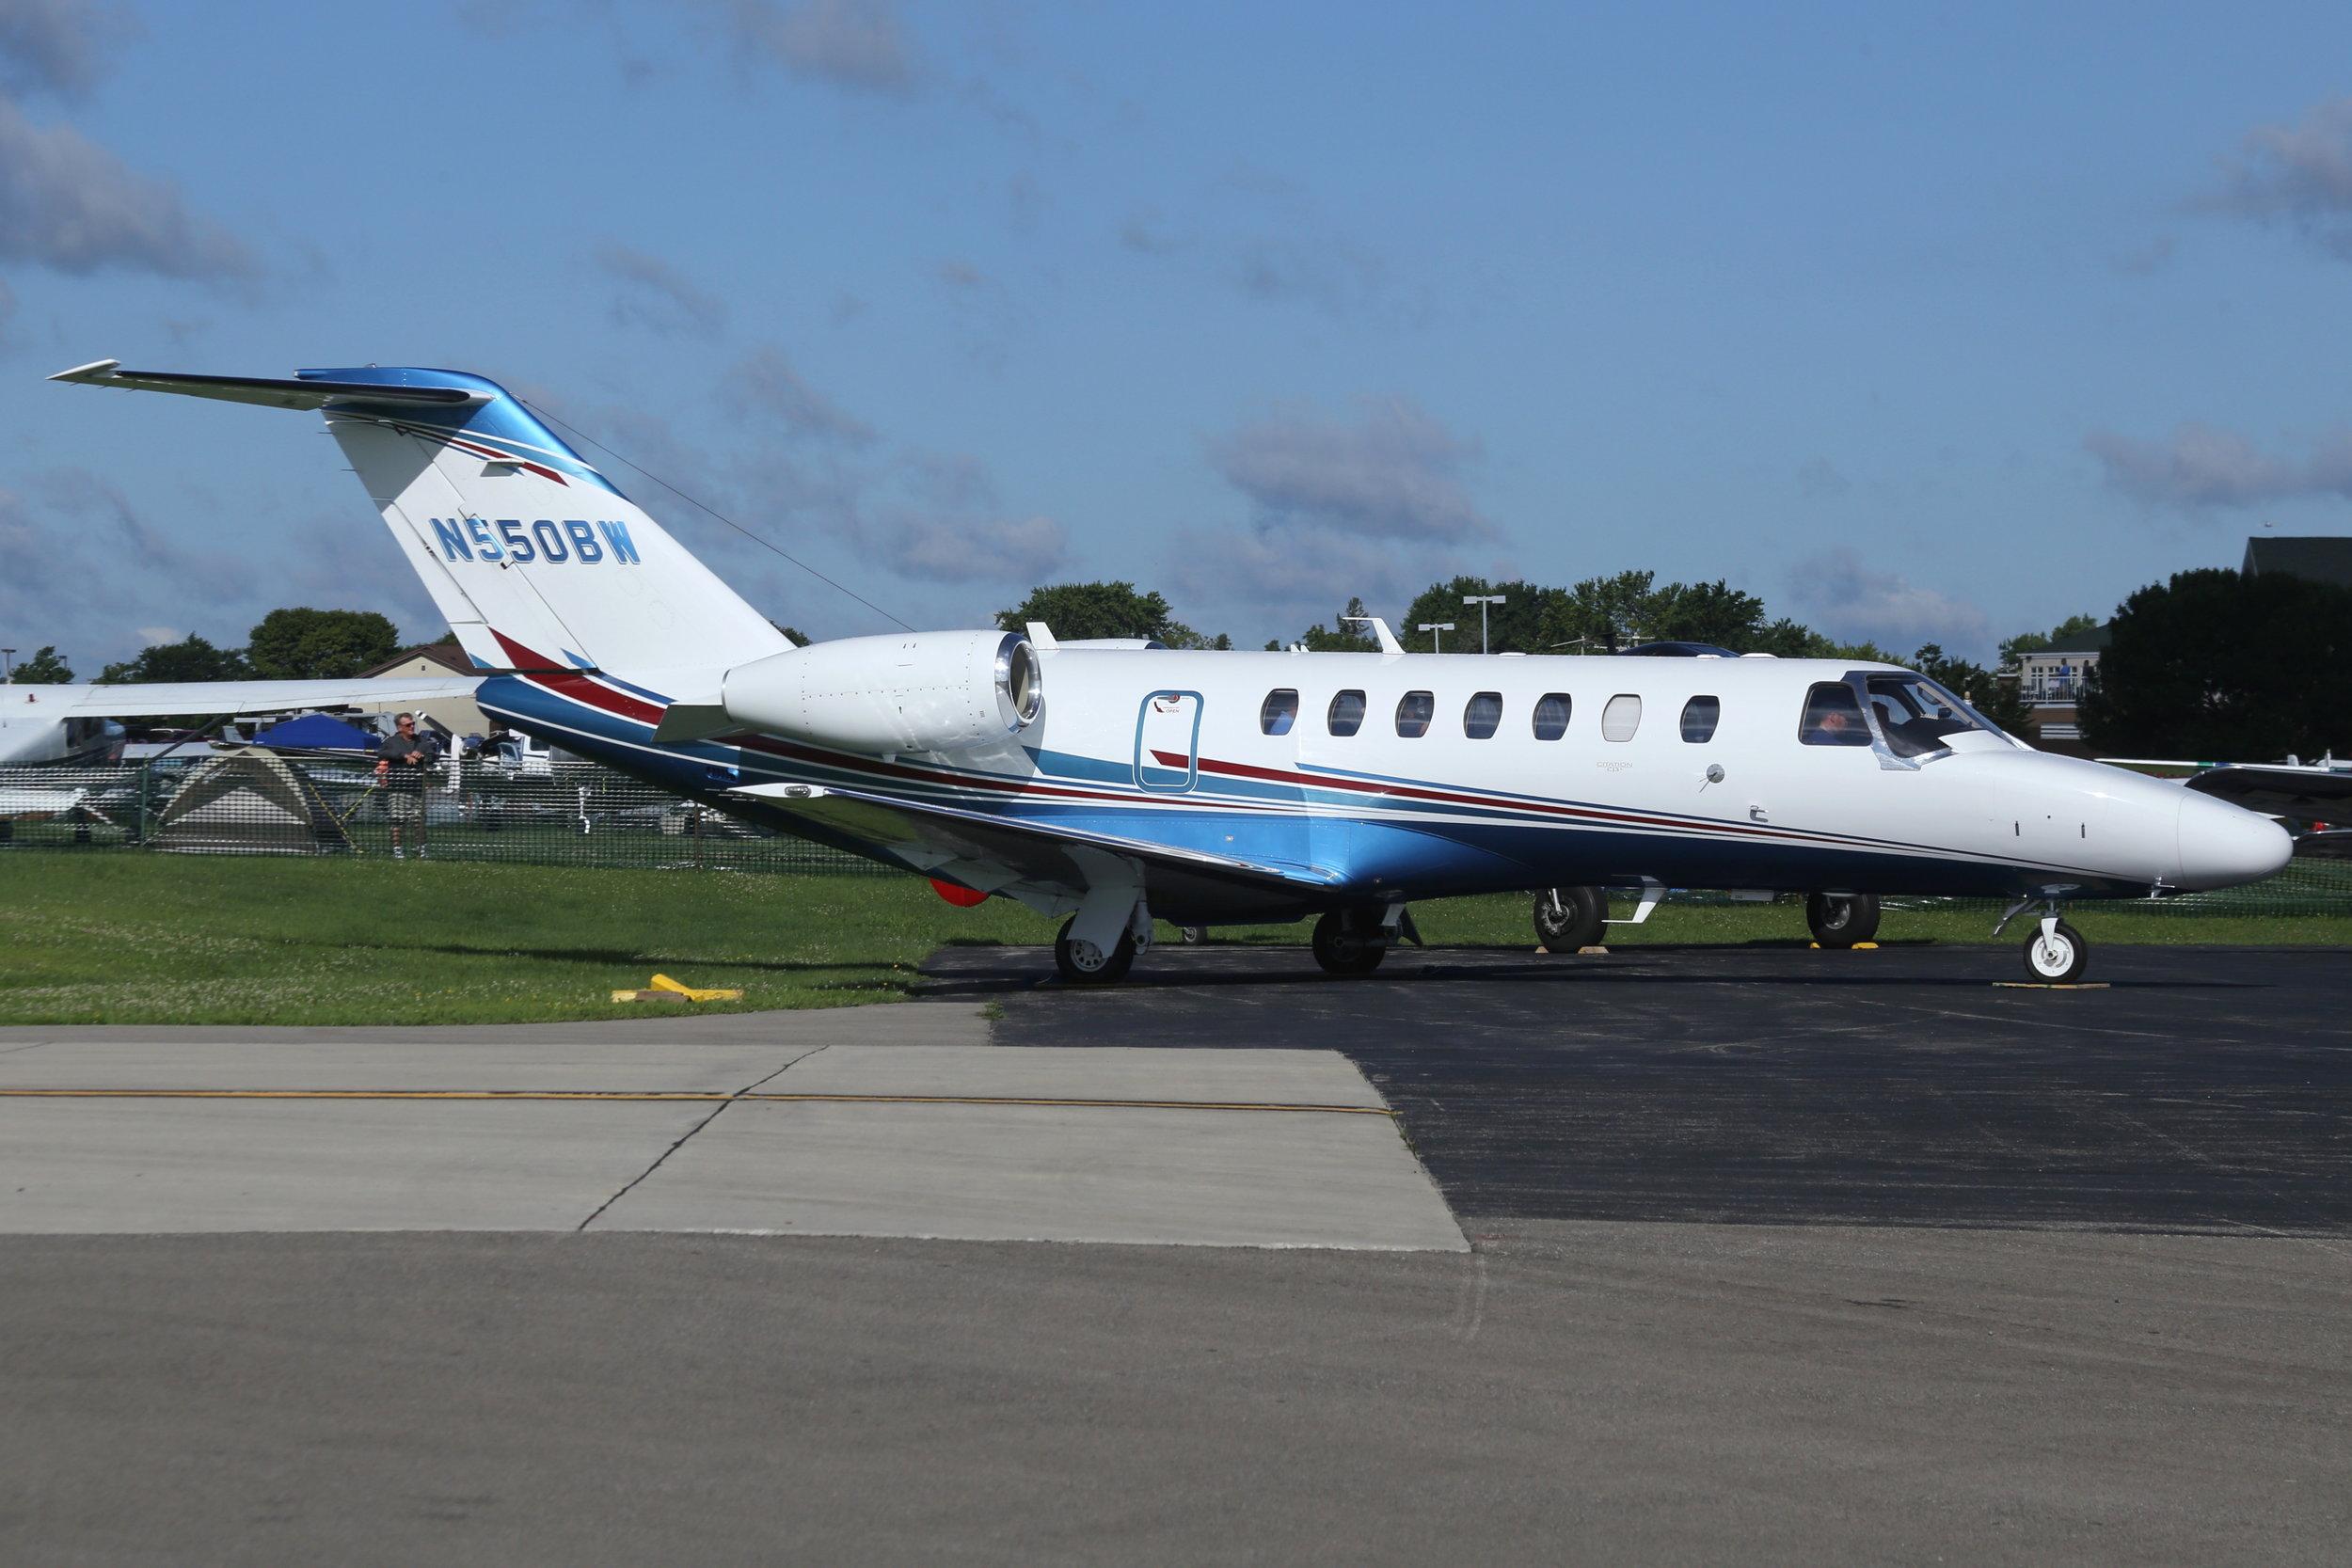 N550BW RAW Leasing Co. Cessna 525B taken at Whitman Regional Airport 26th July 208 by John Wood